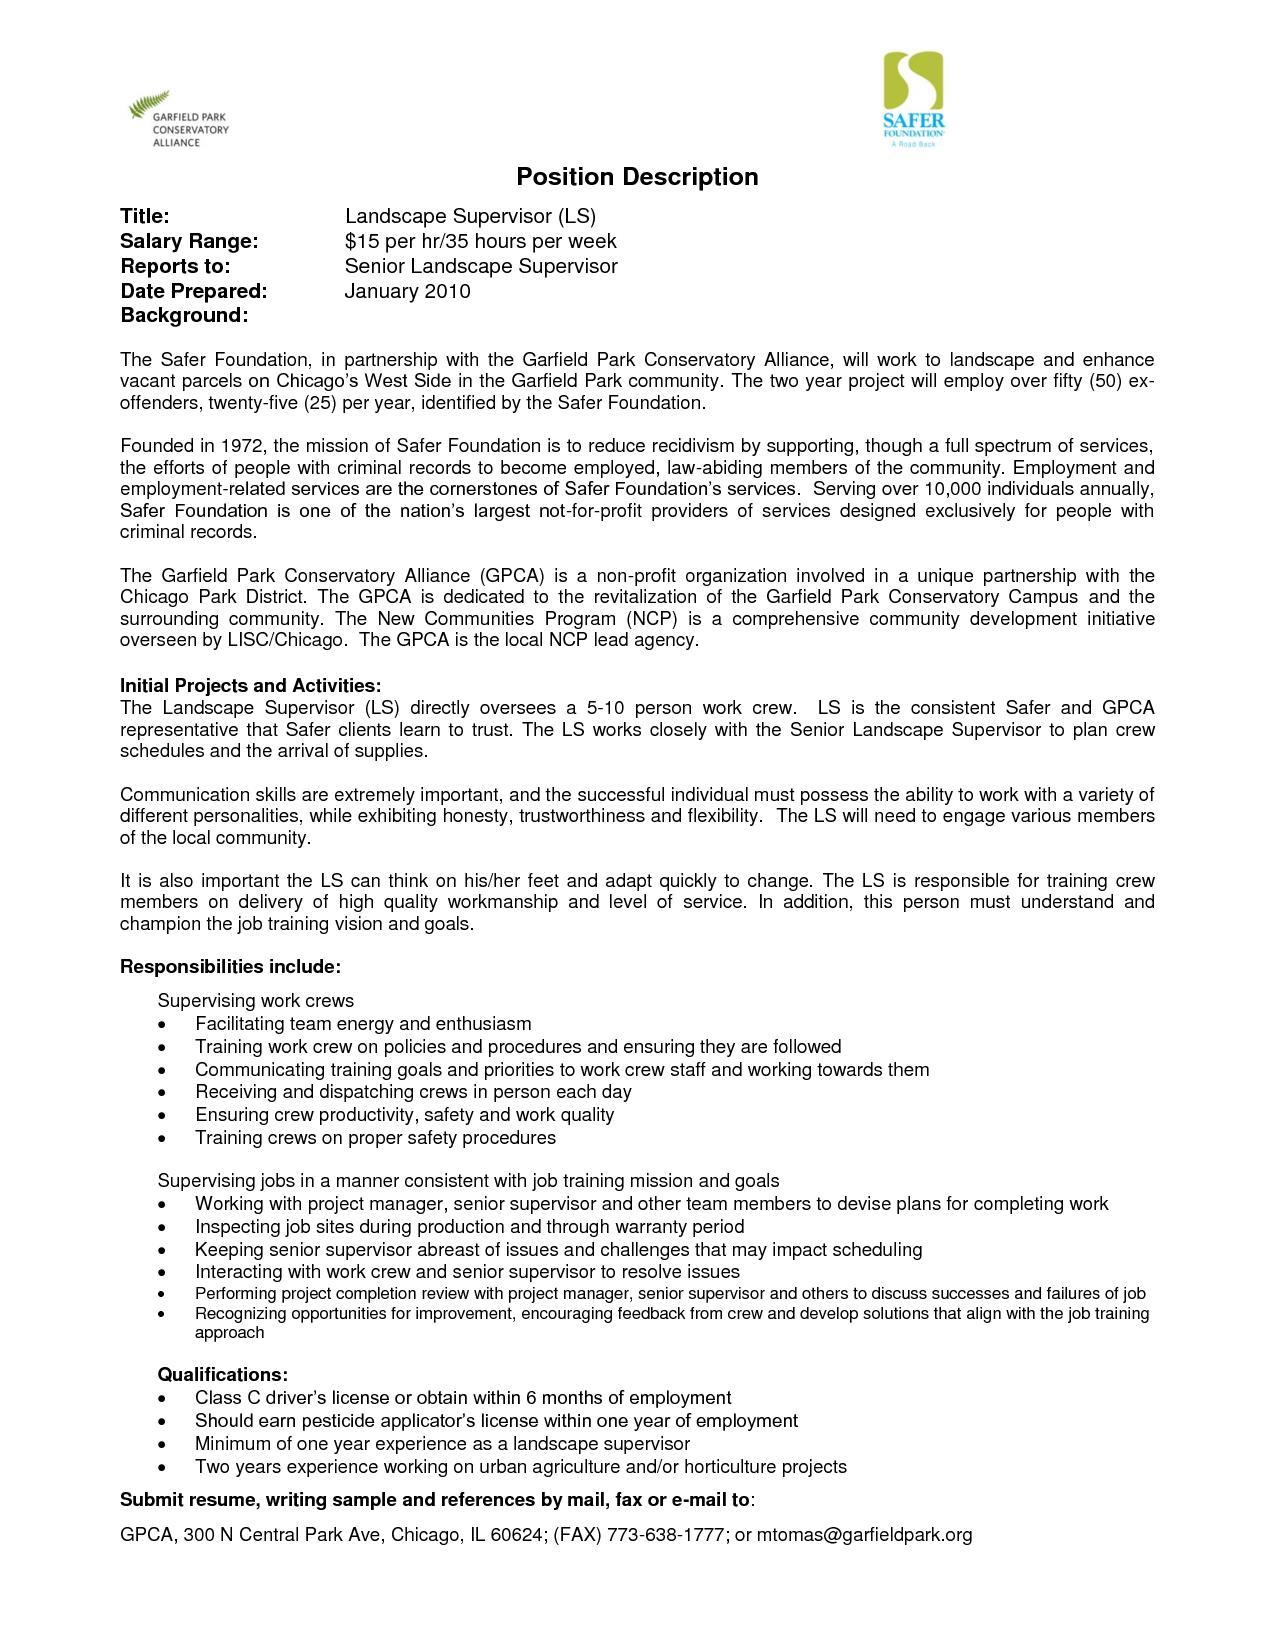 warehouse worker job description resume